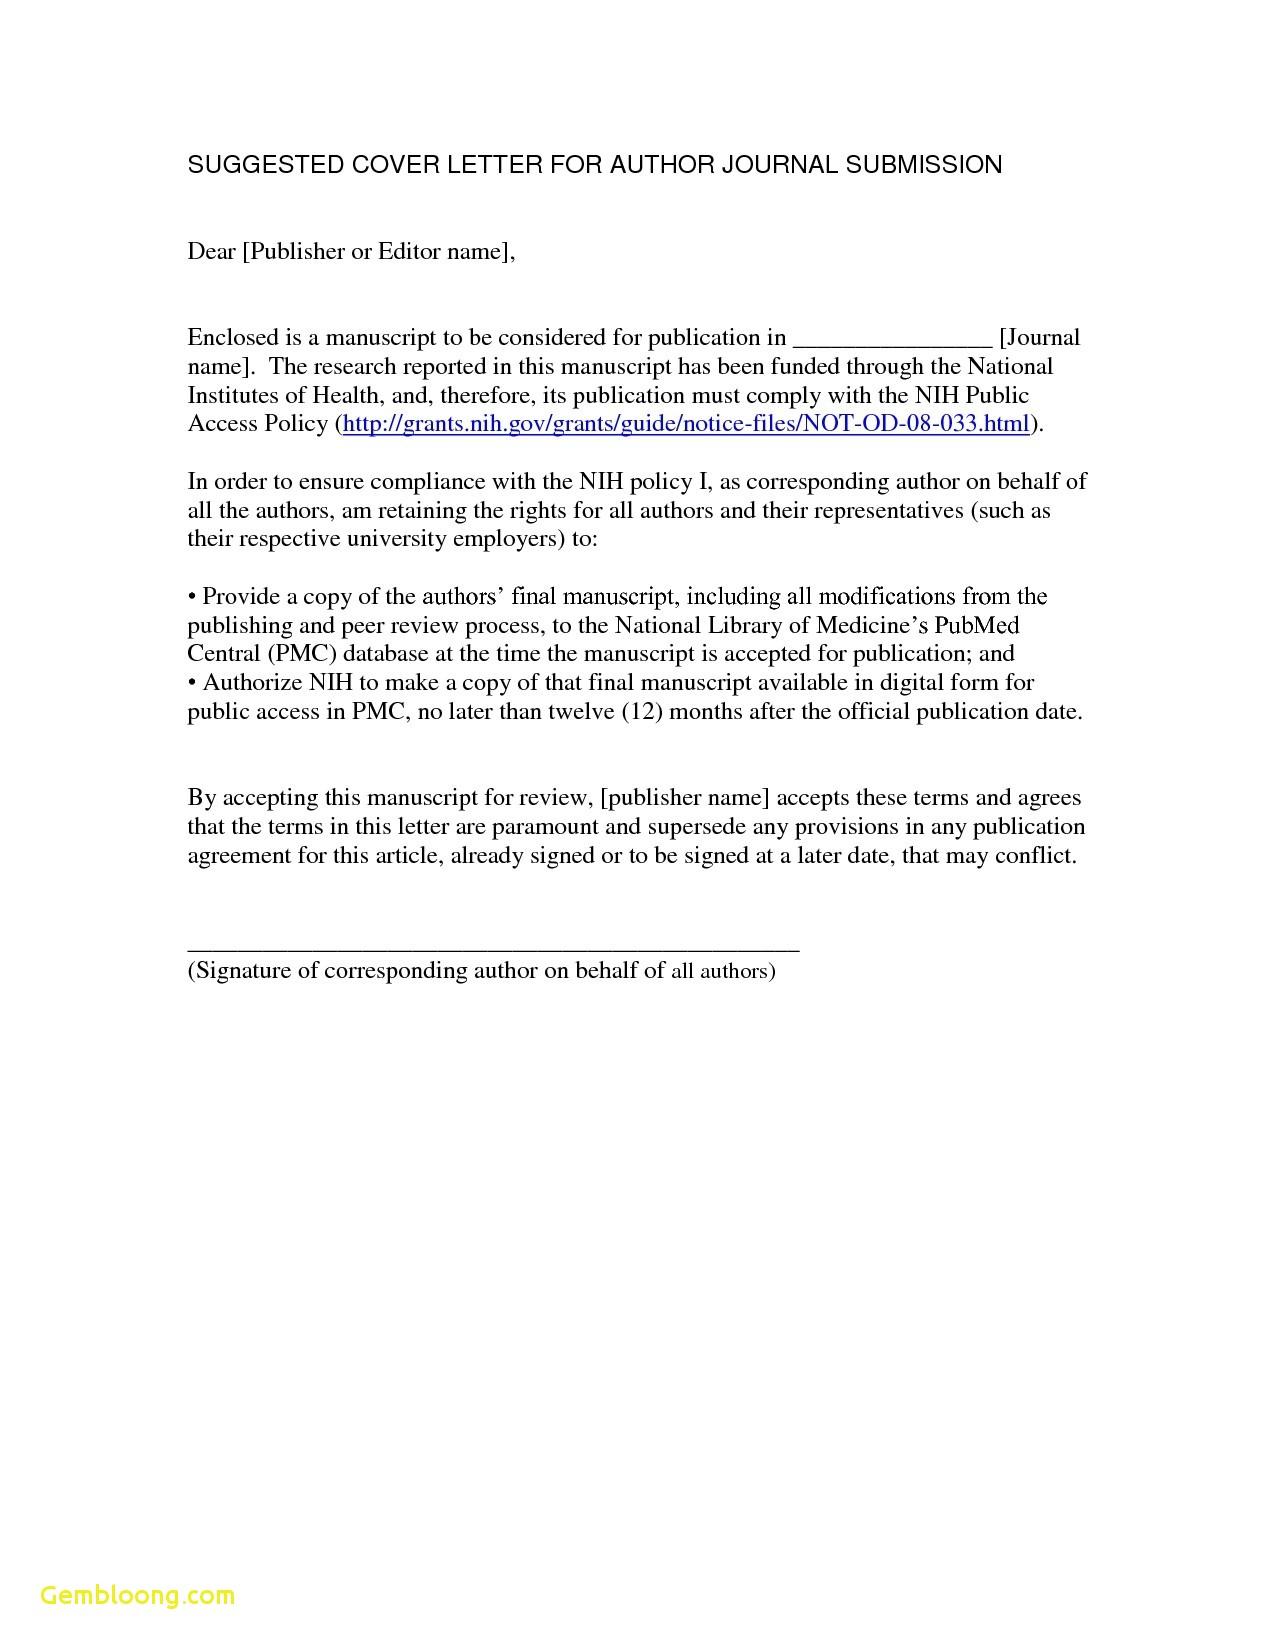 Short Cover Letter Template - Short Application Cover Letter Examples formal Letter Template Usa